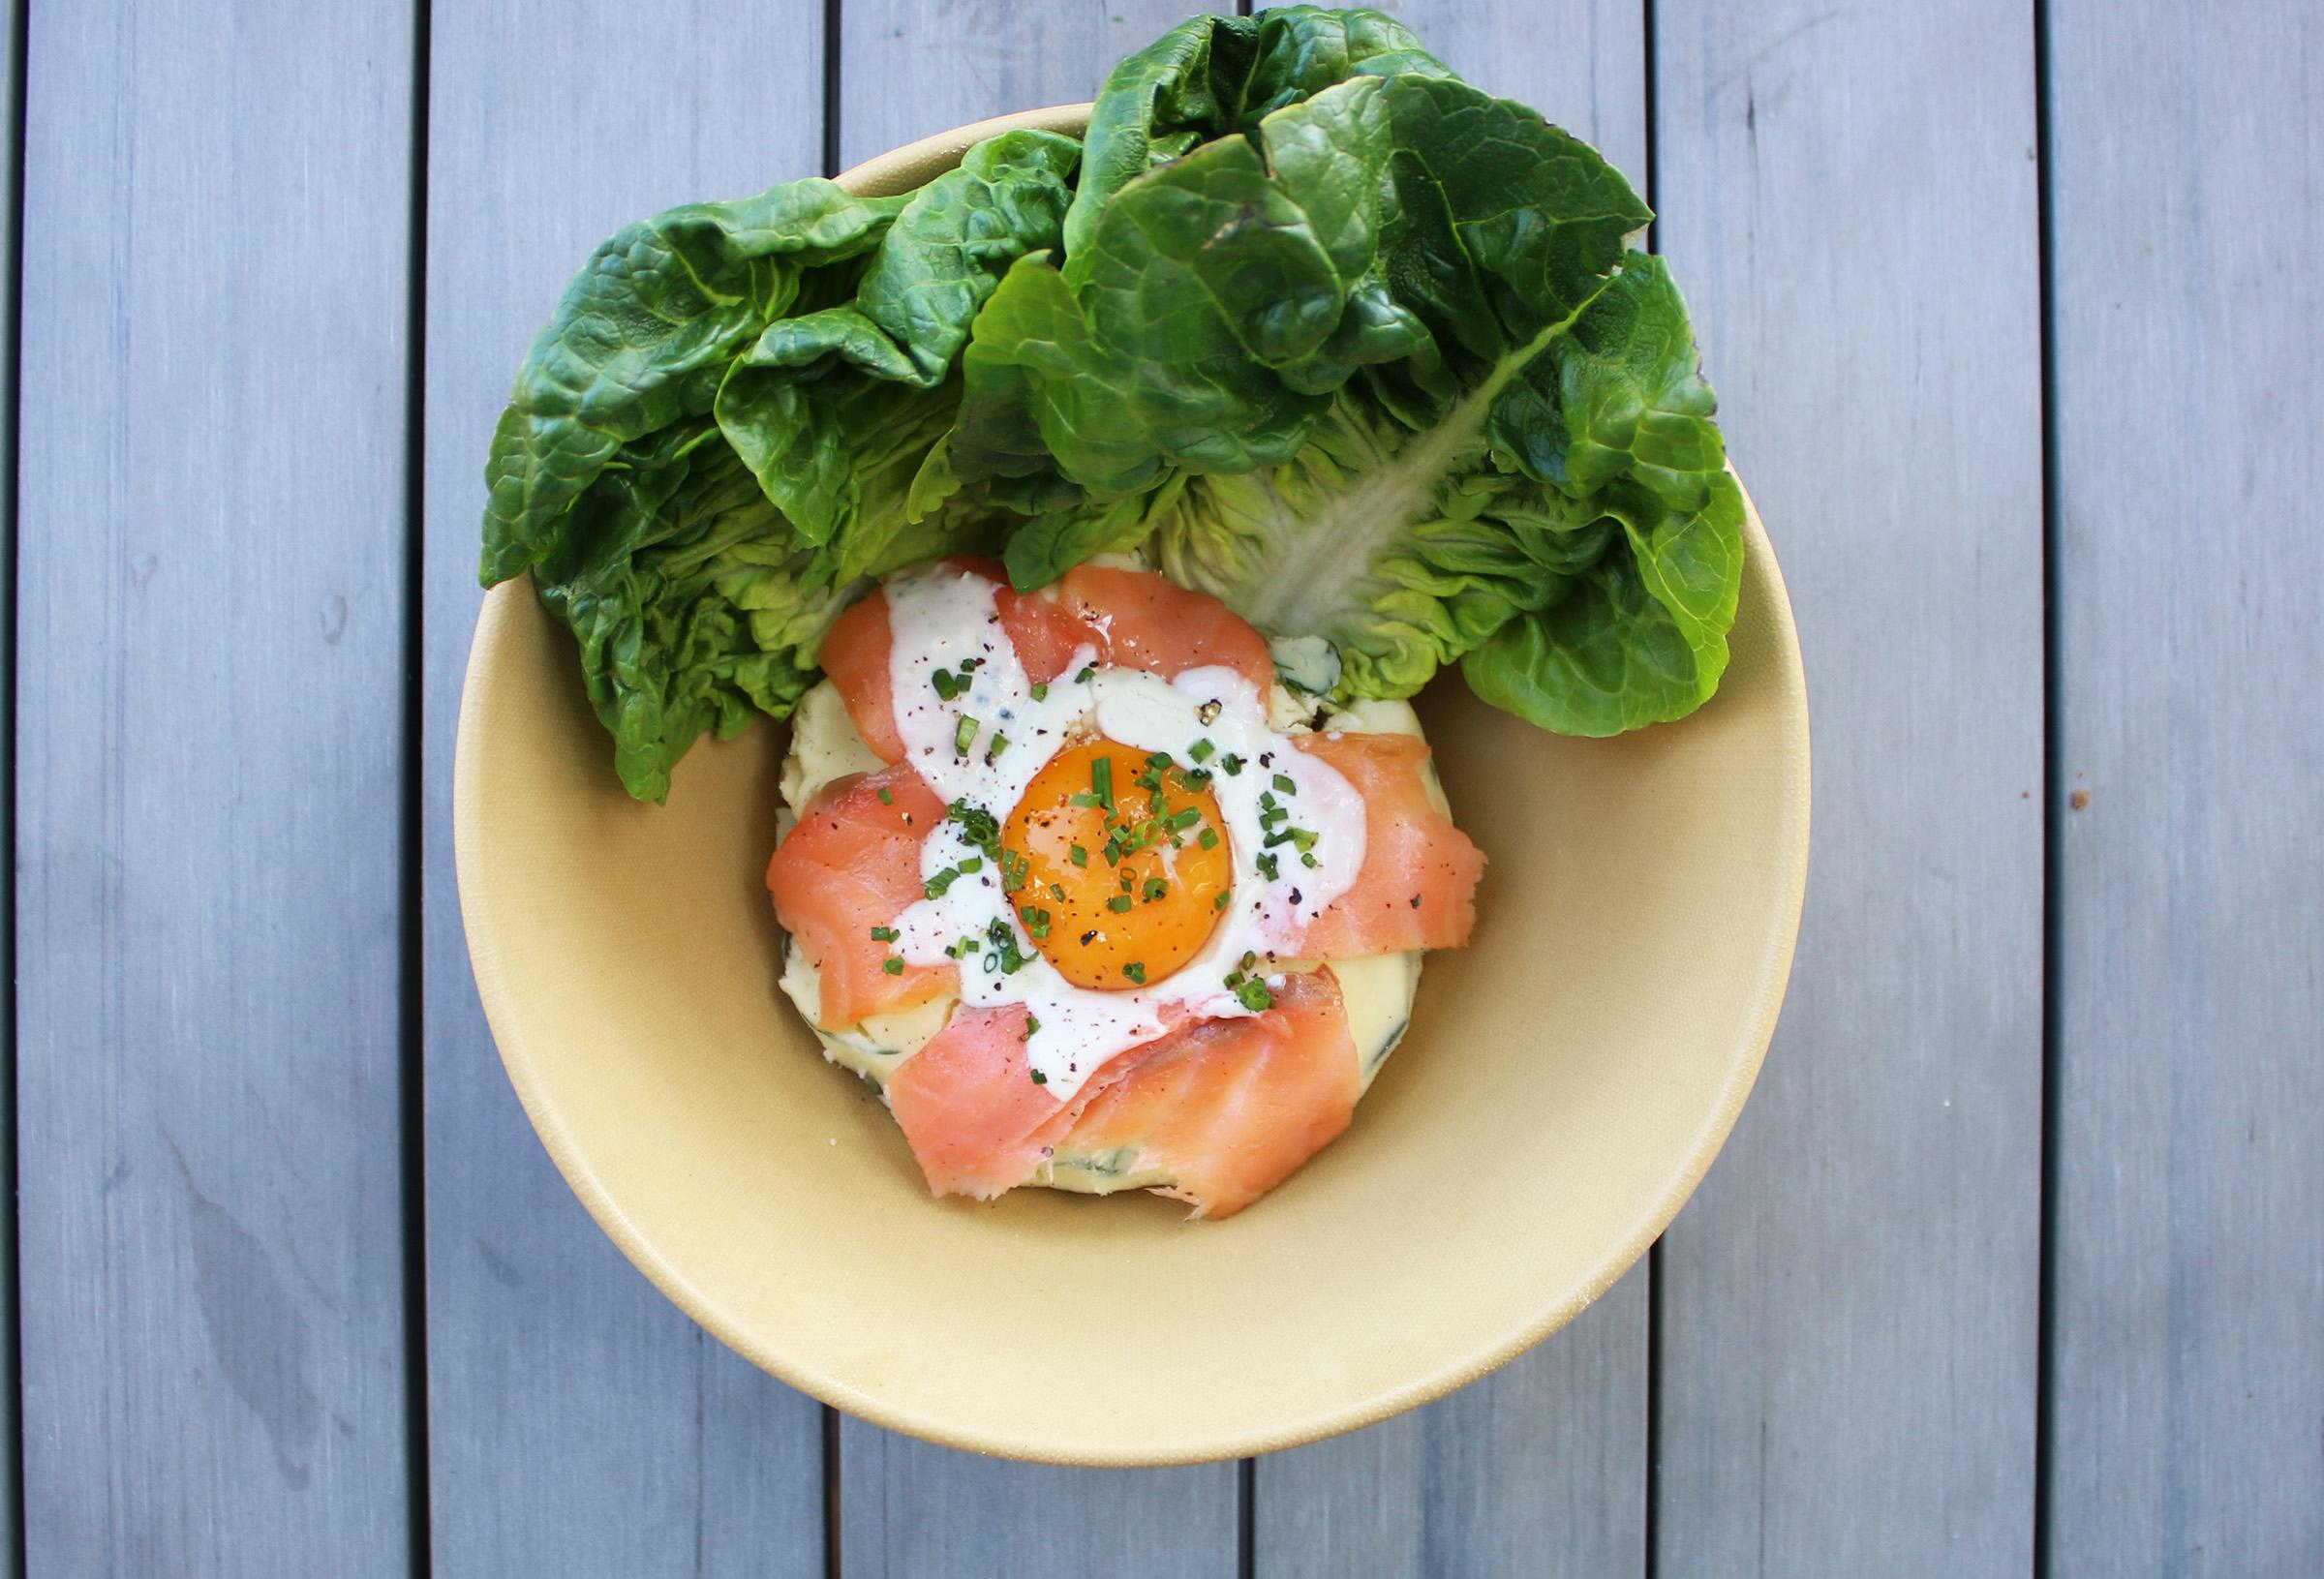 UMI POTATO SALAD: smoked salmon, dill, pickle, truffle blue cheese cream sauce, egg yolk, gem lettuce